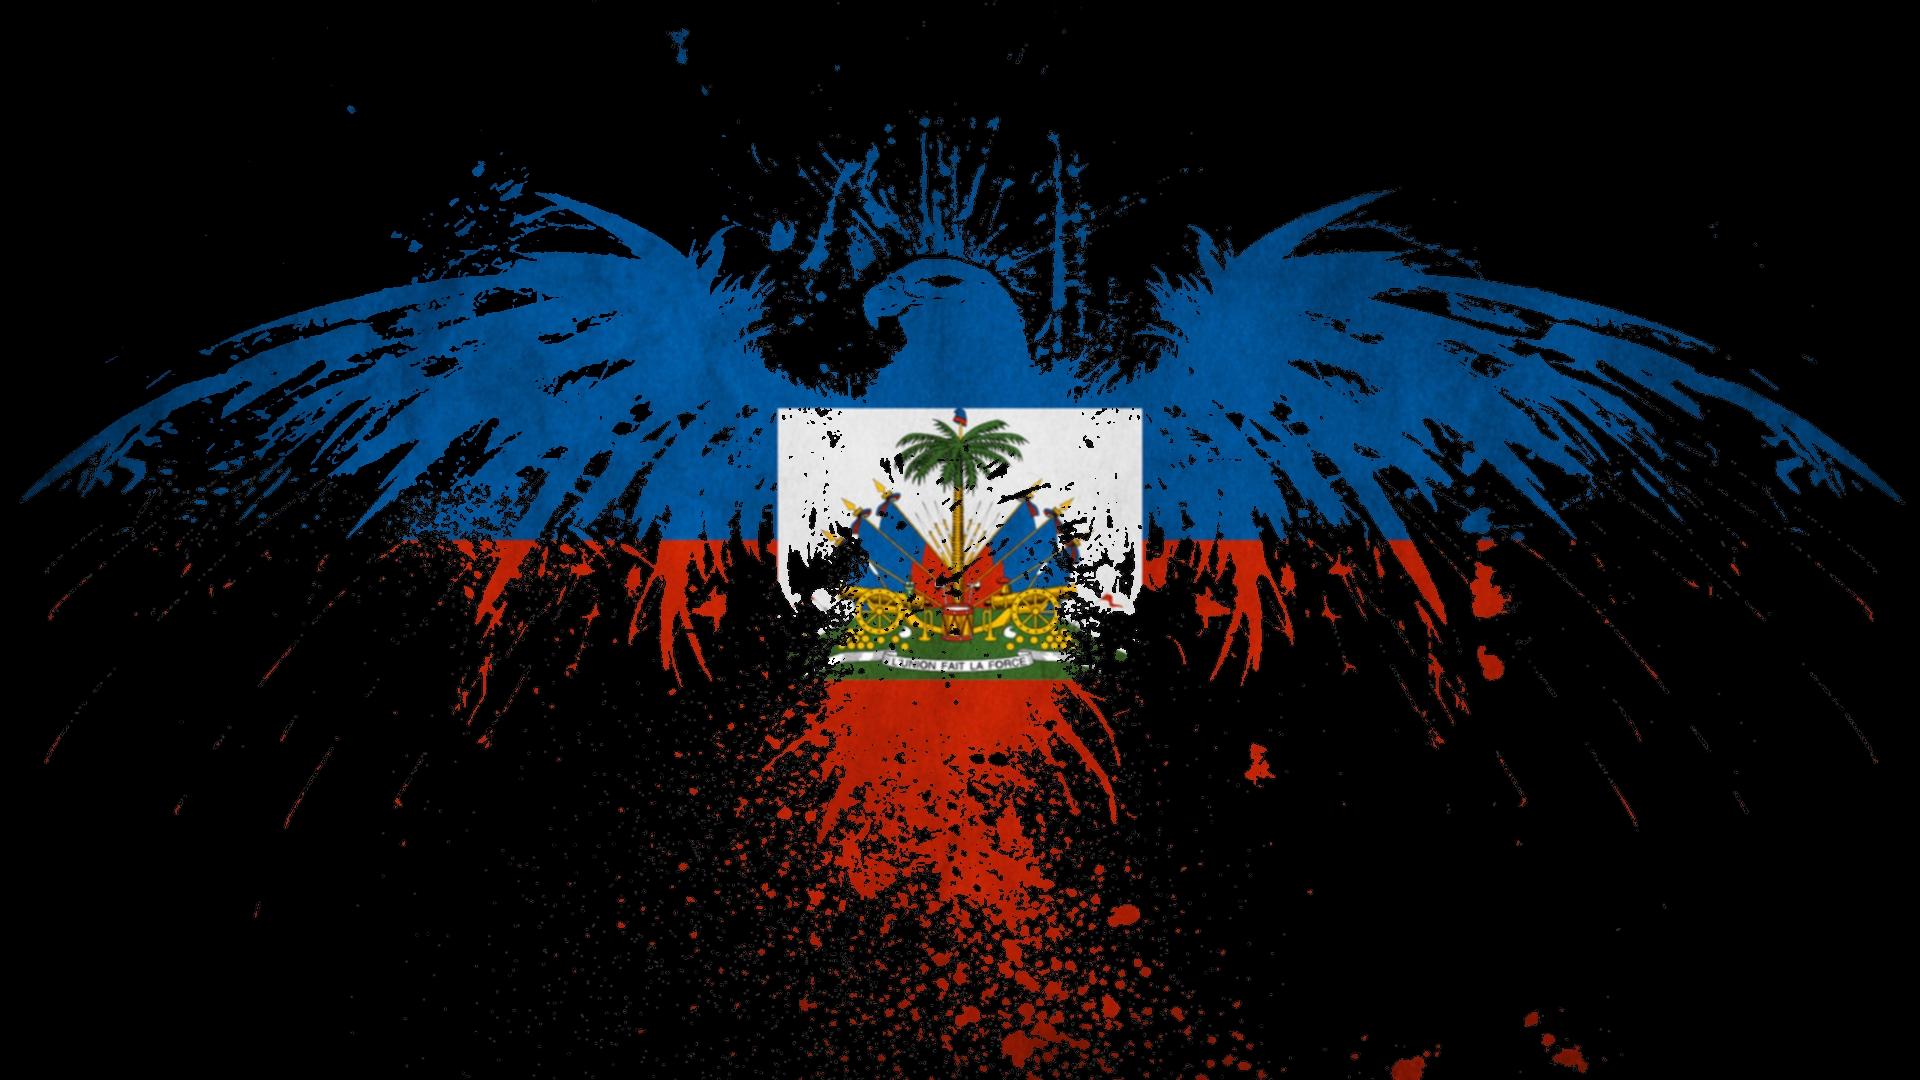 Best 36 Haiti Wallpaper on HipWallpaper Haiti Wallpaper Haiti 1920x1080